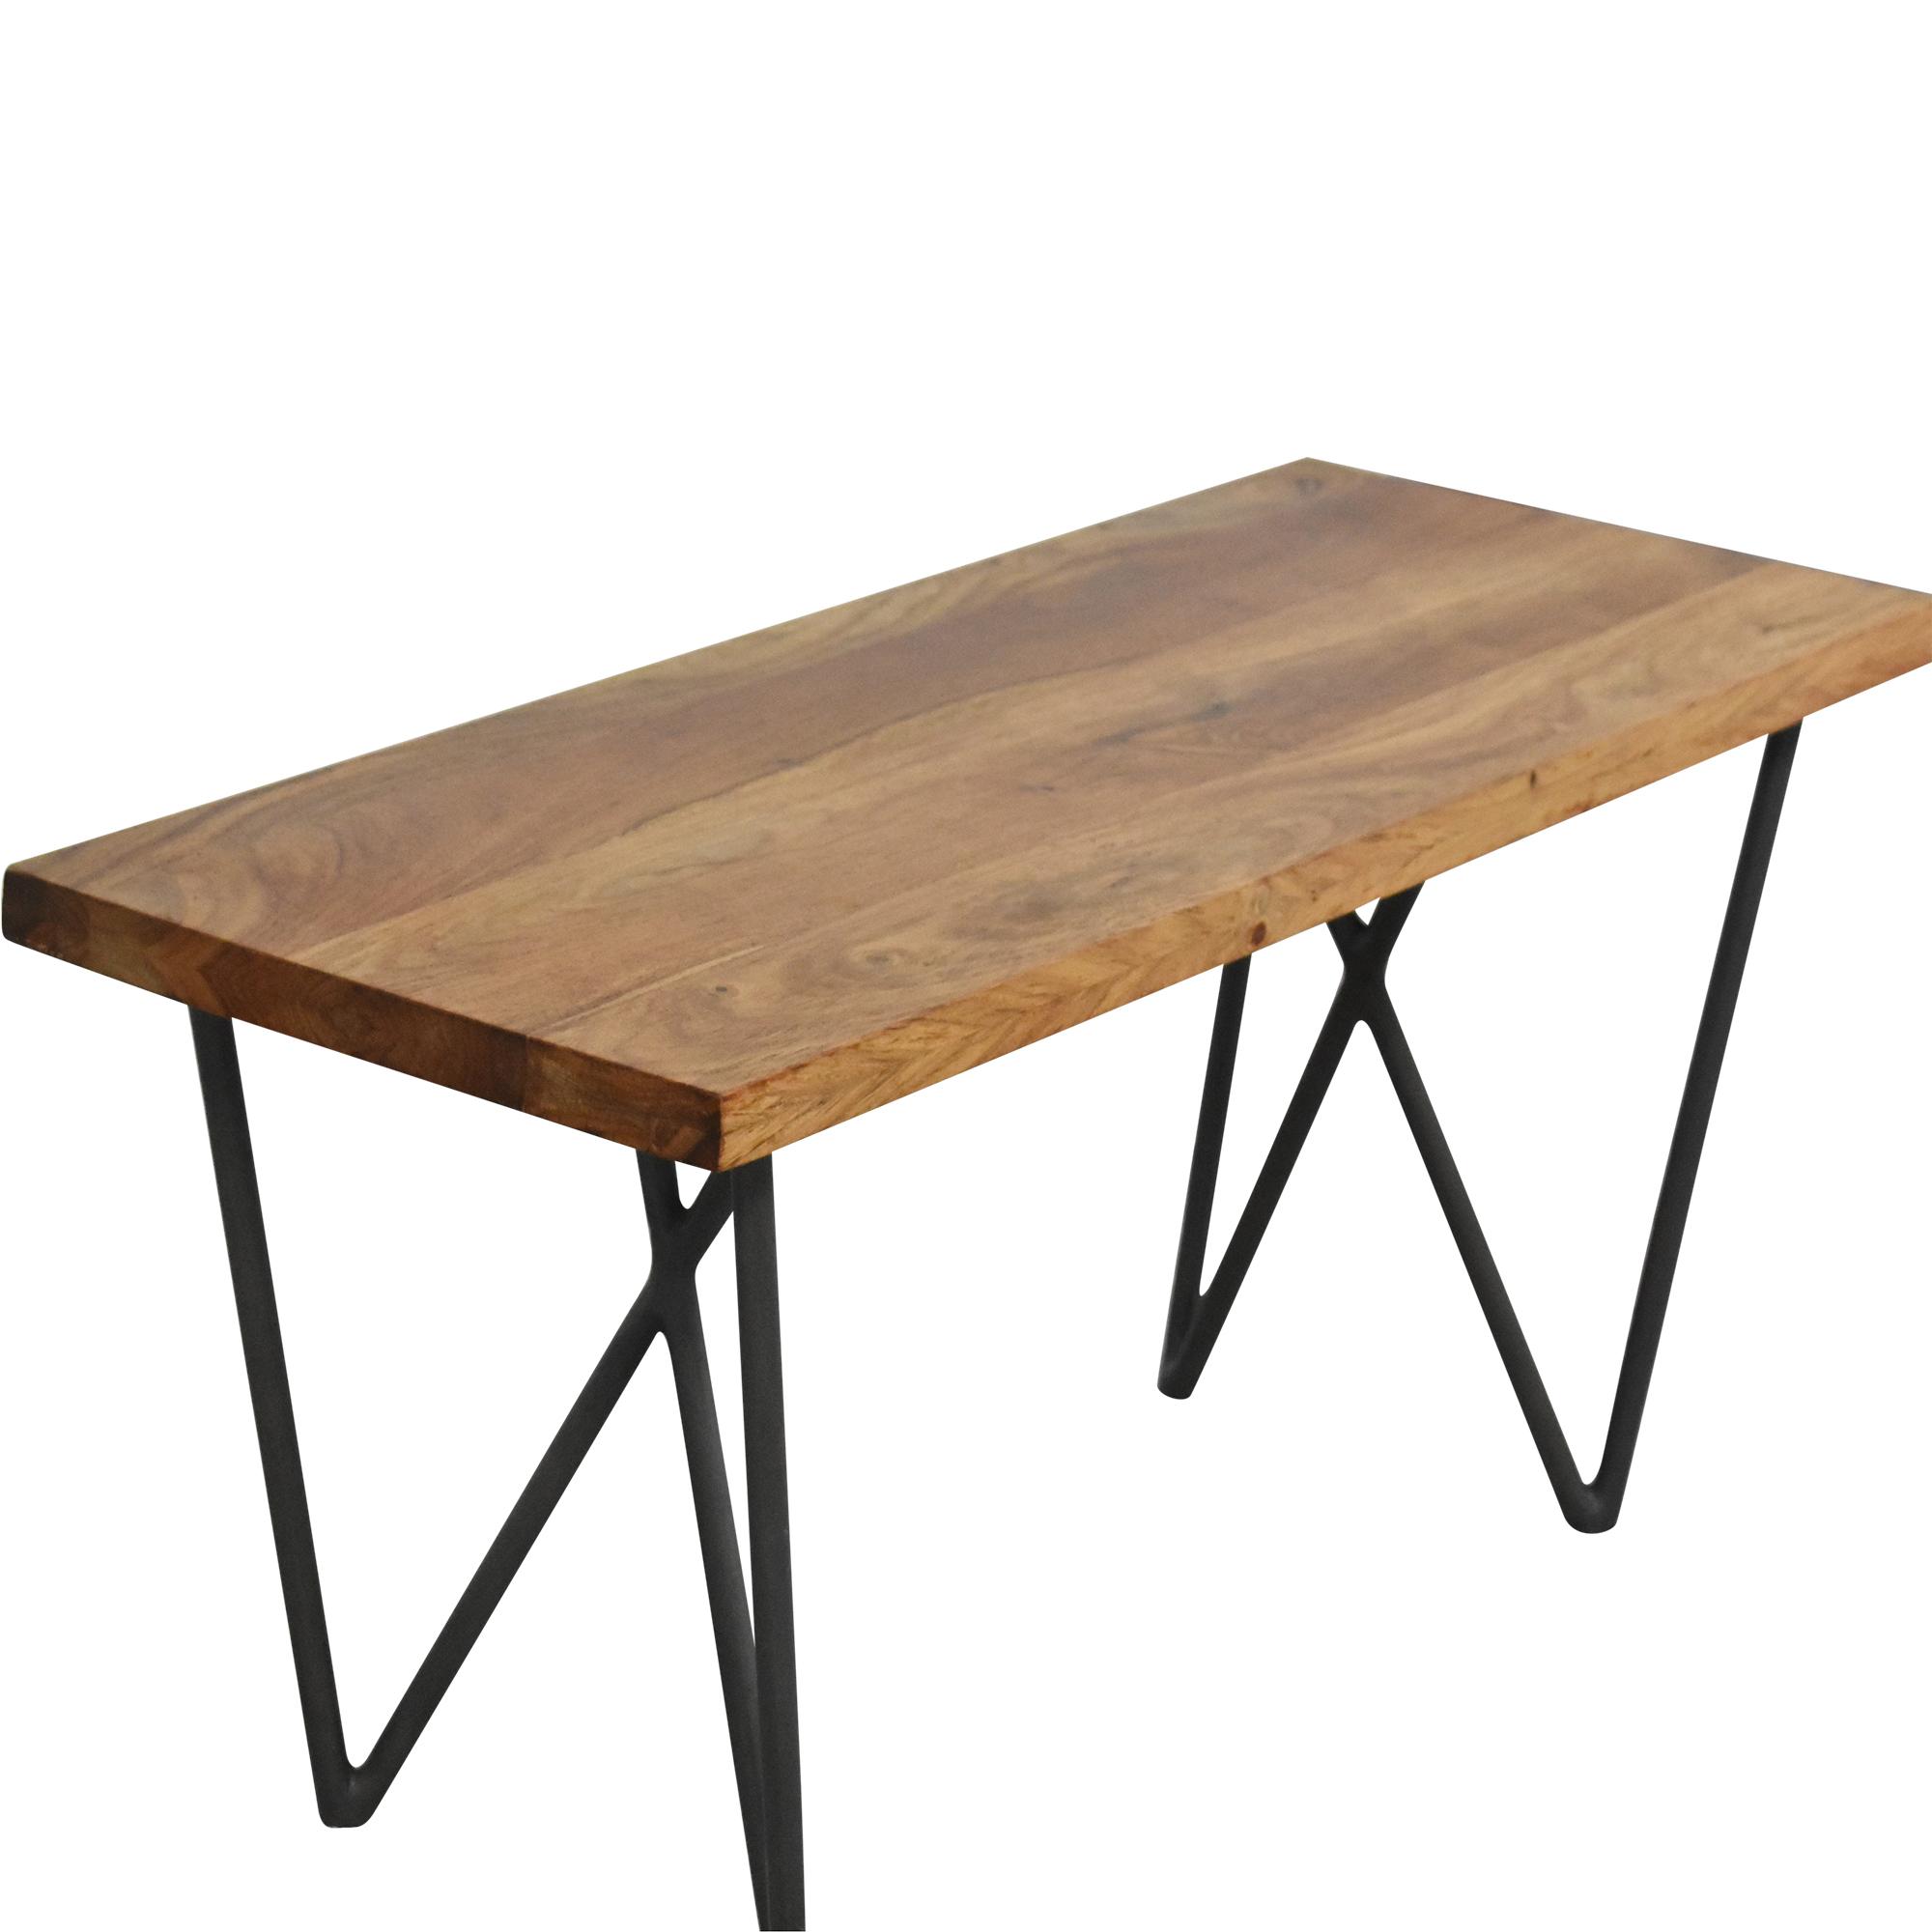 CB2 Dylan Medium Bench / Chairs